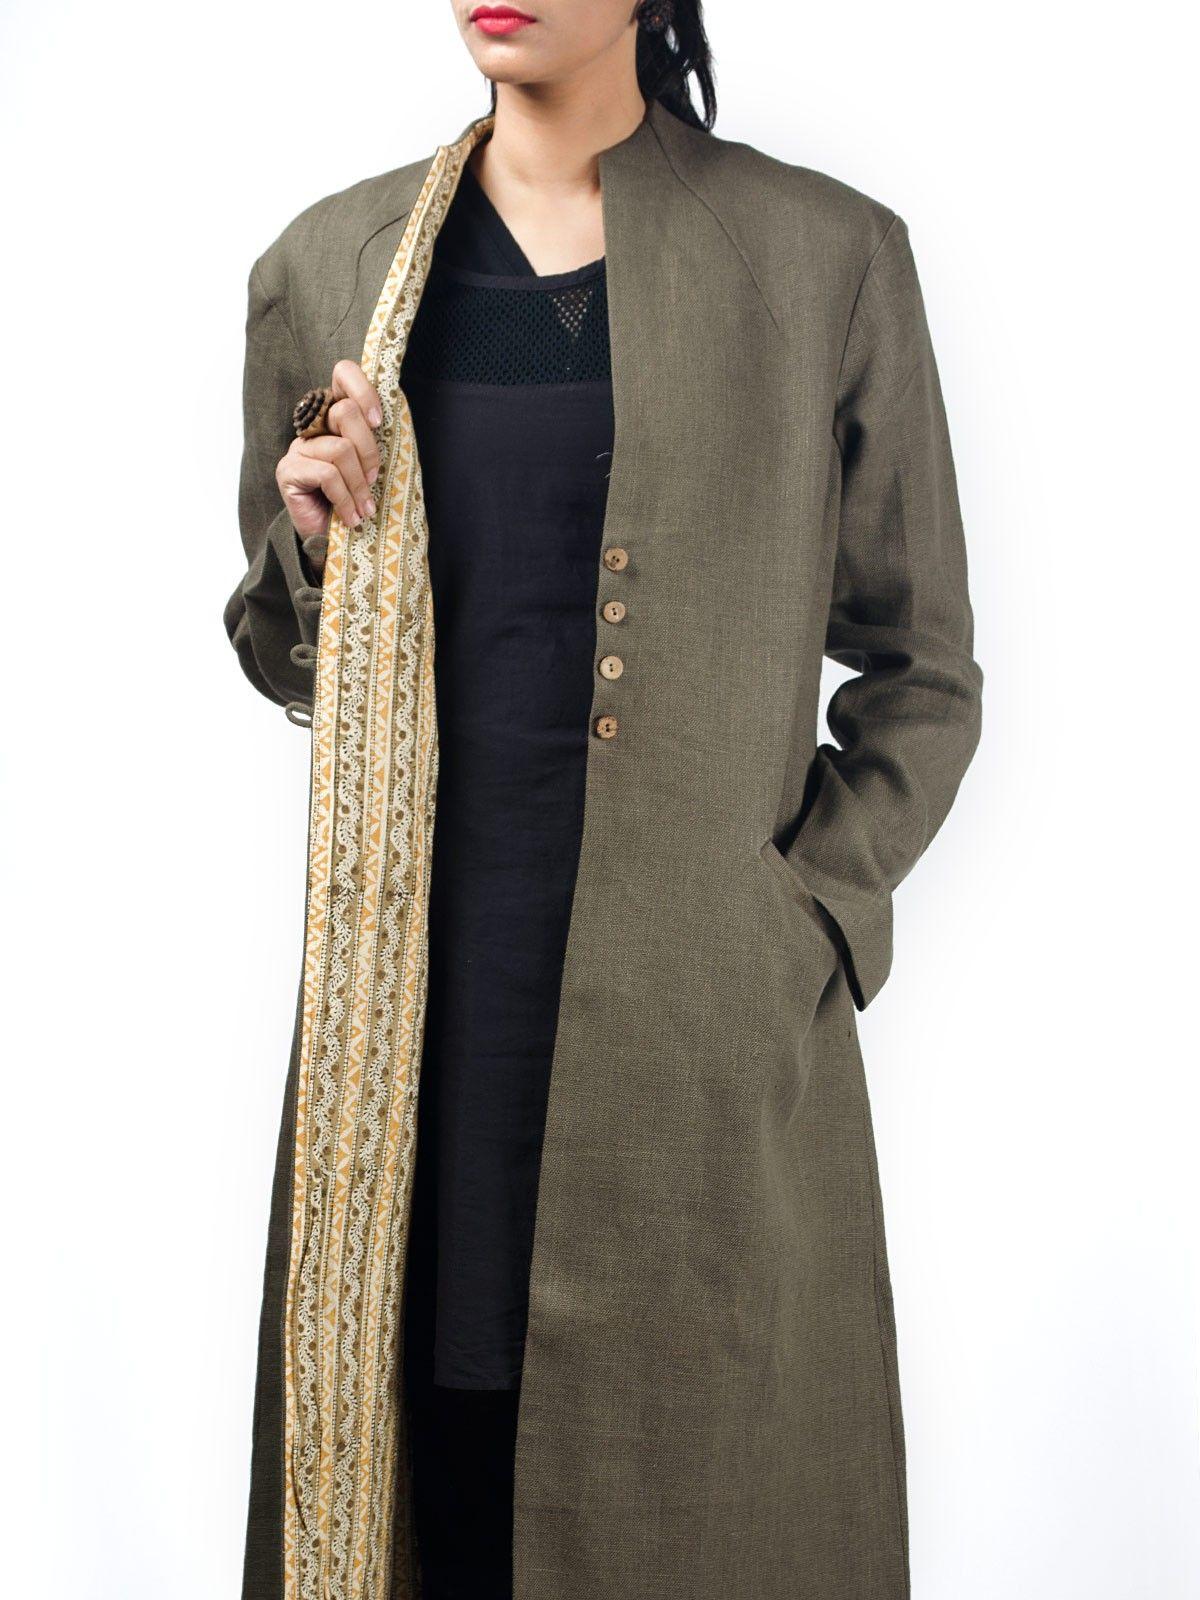 Olive green linen full sleeves long winter jacket